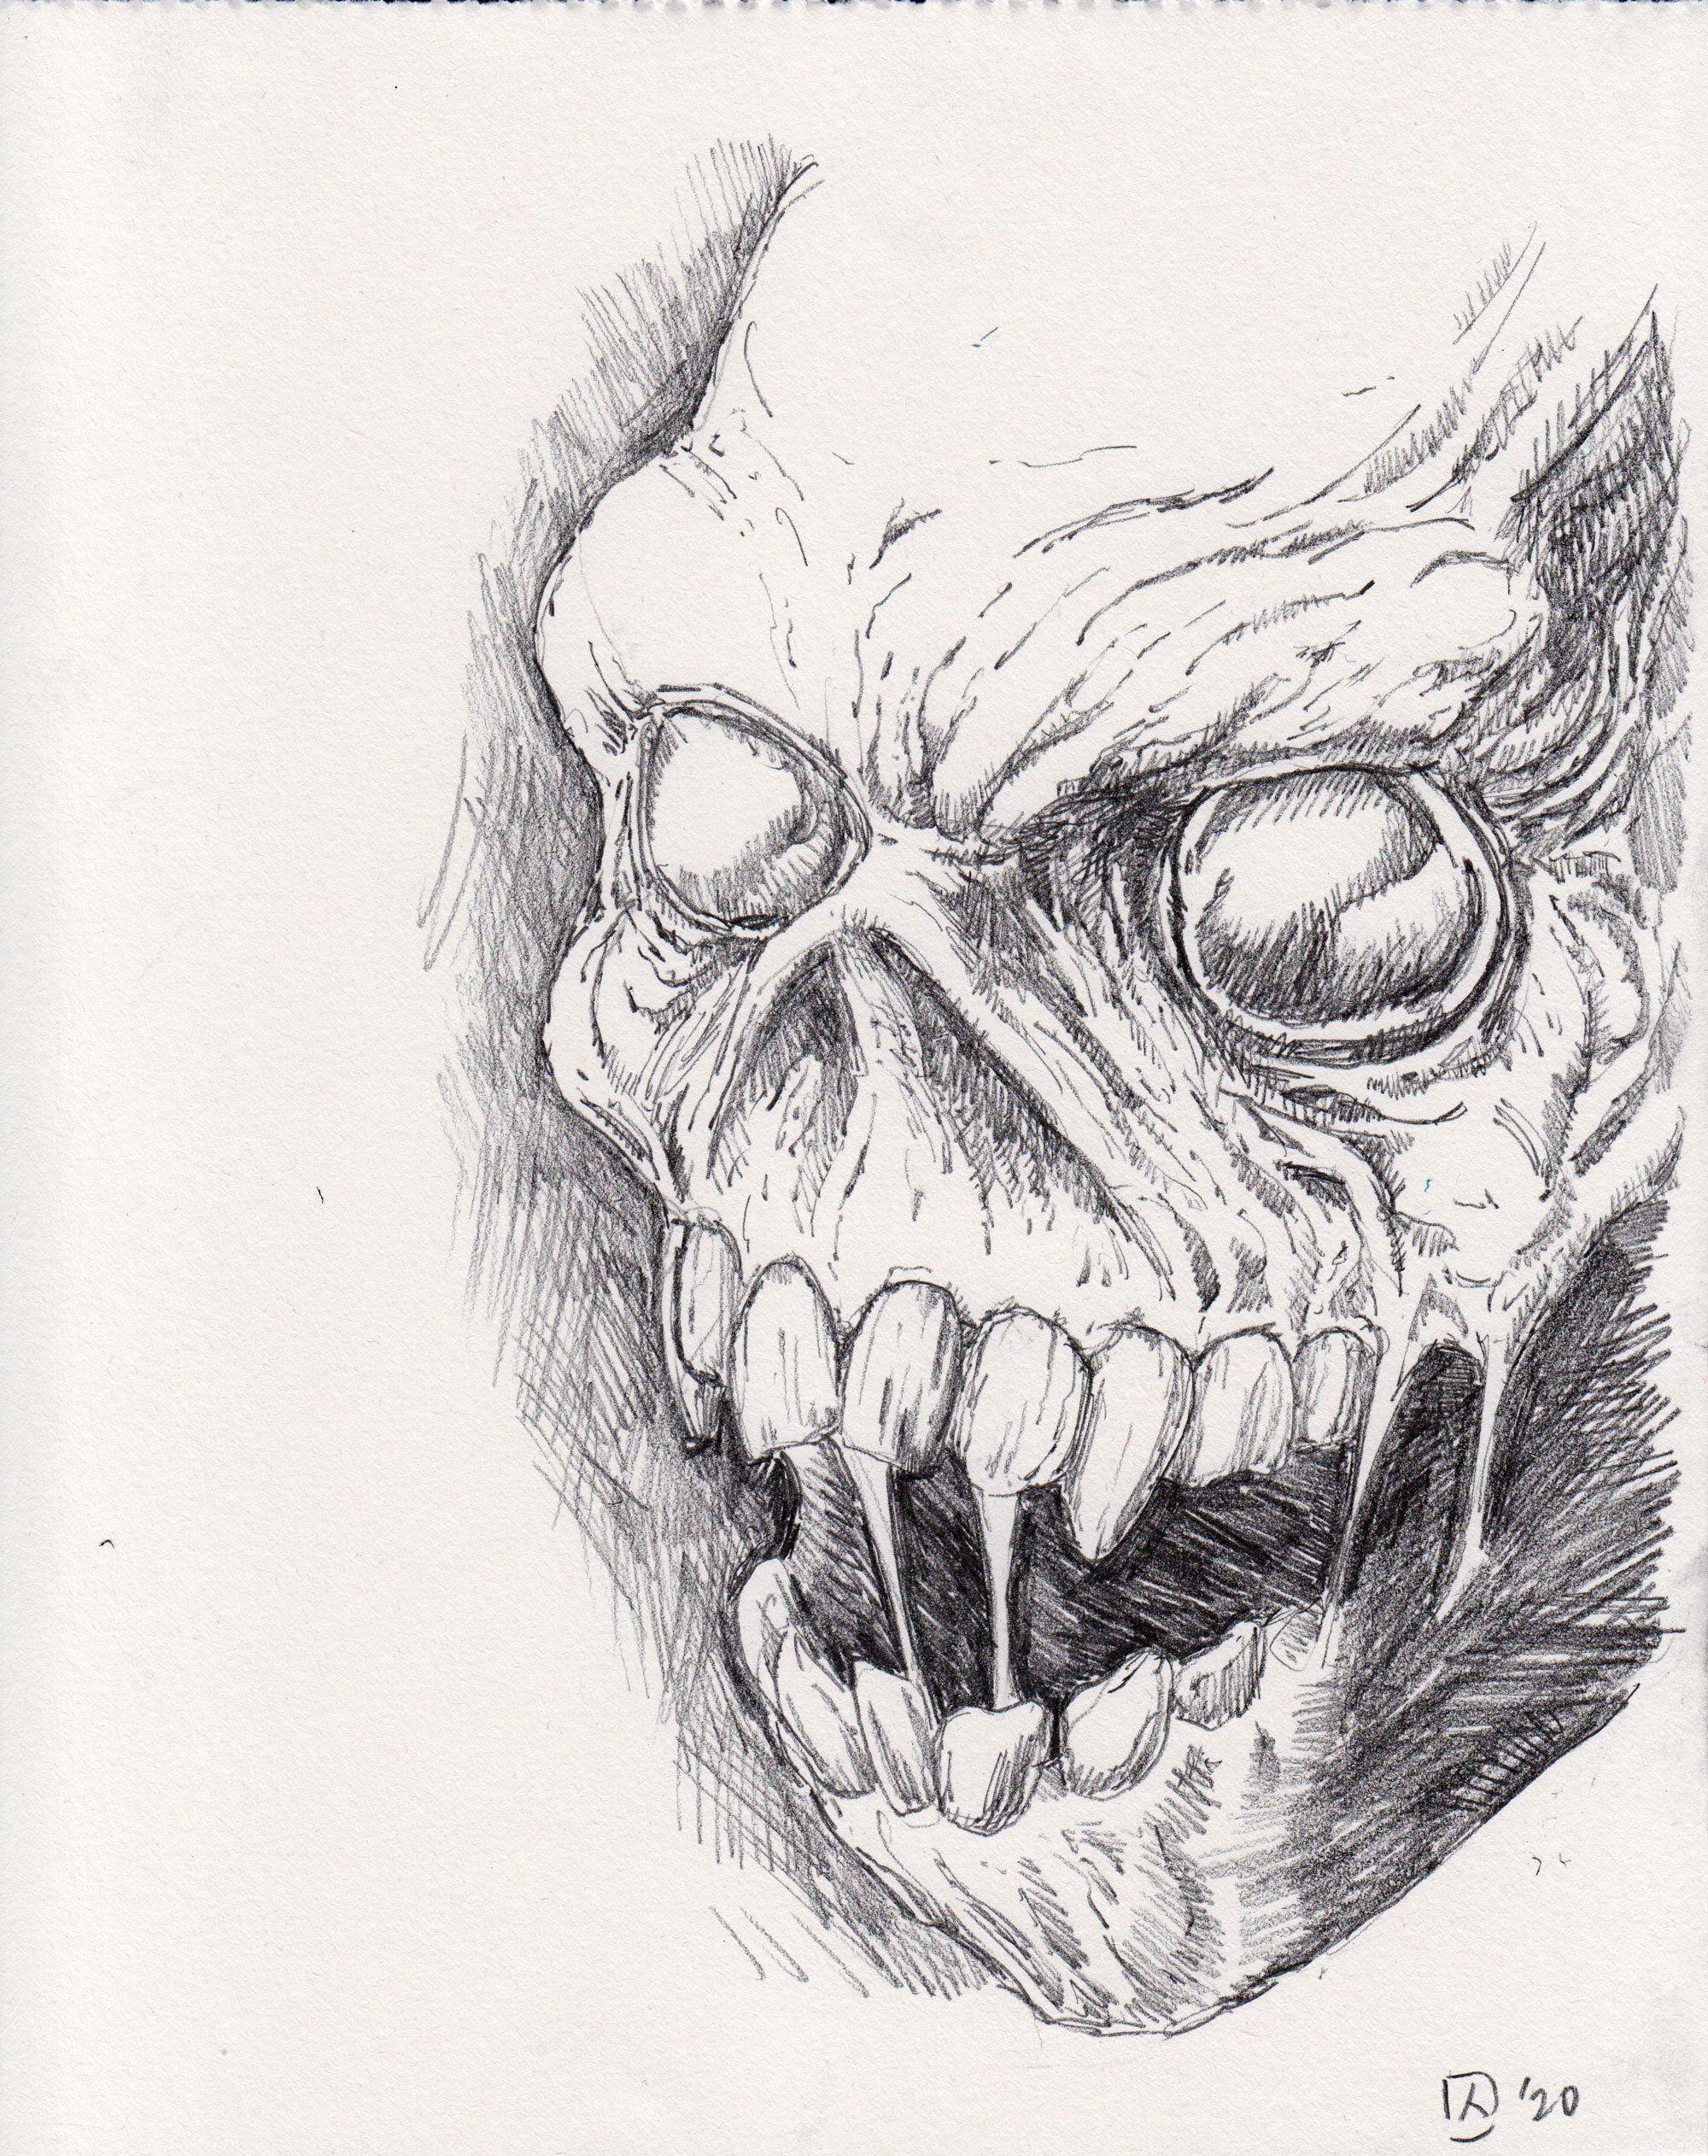 Pencil Original: The Smiling Skull